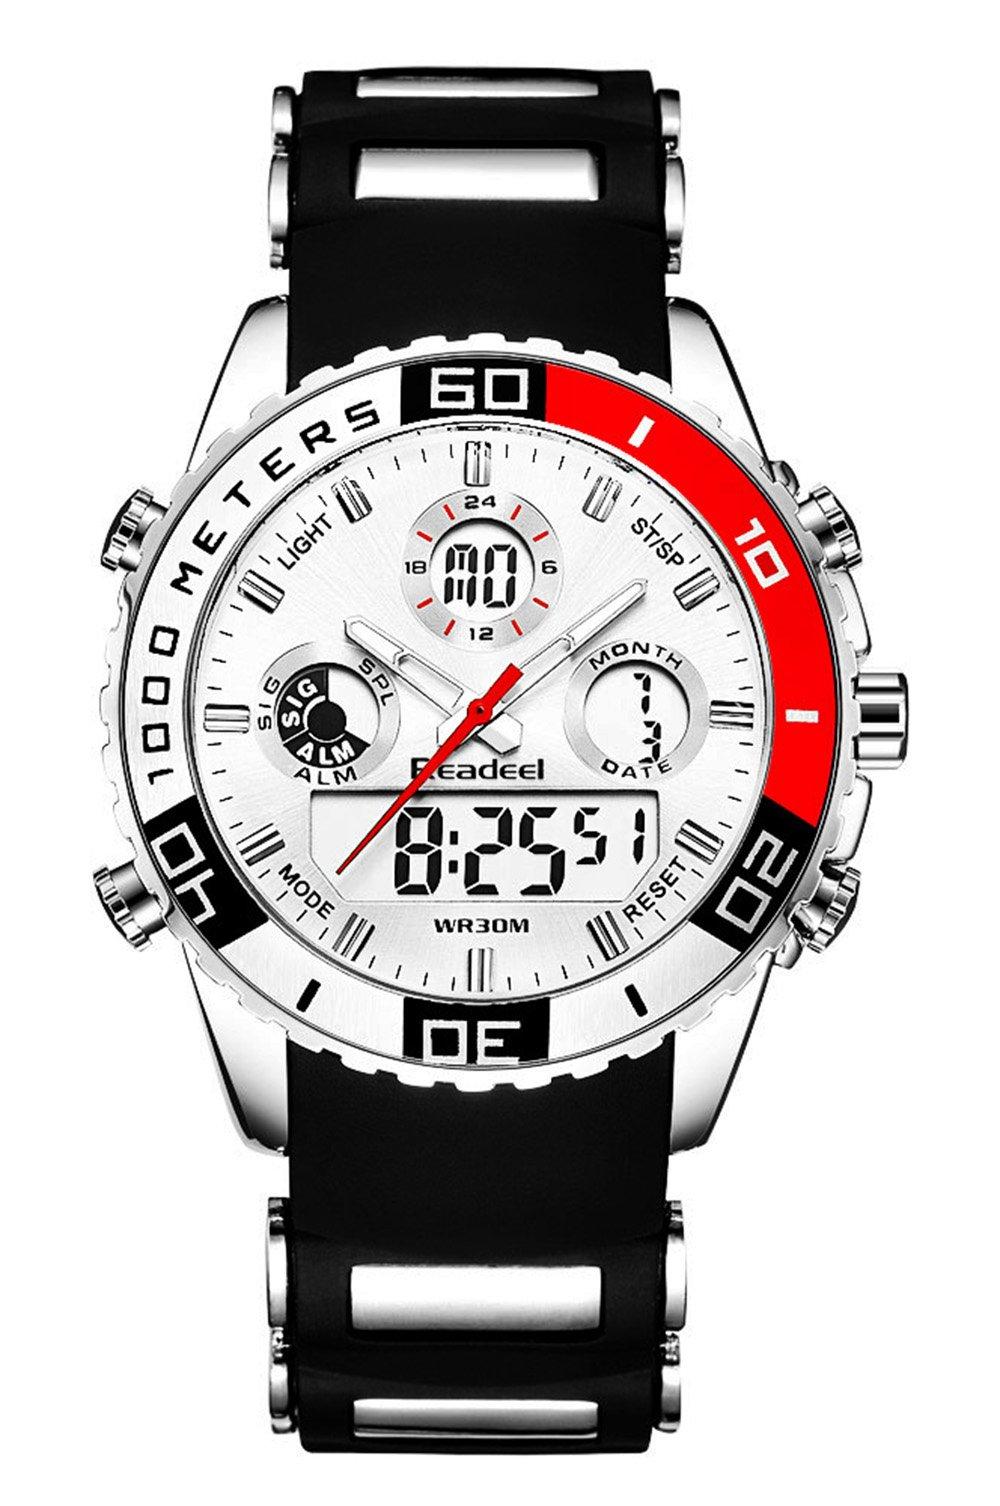 Youwen Top Brand Mens Sport Watches Men Quartz Analog LED Clock Man Military Waterproof Watch Sport by Youwen